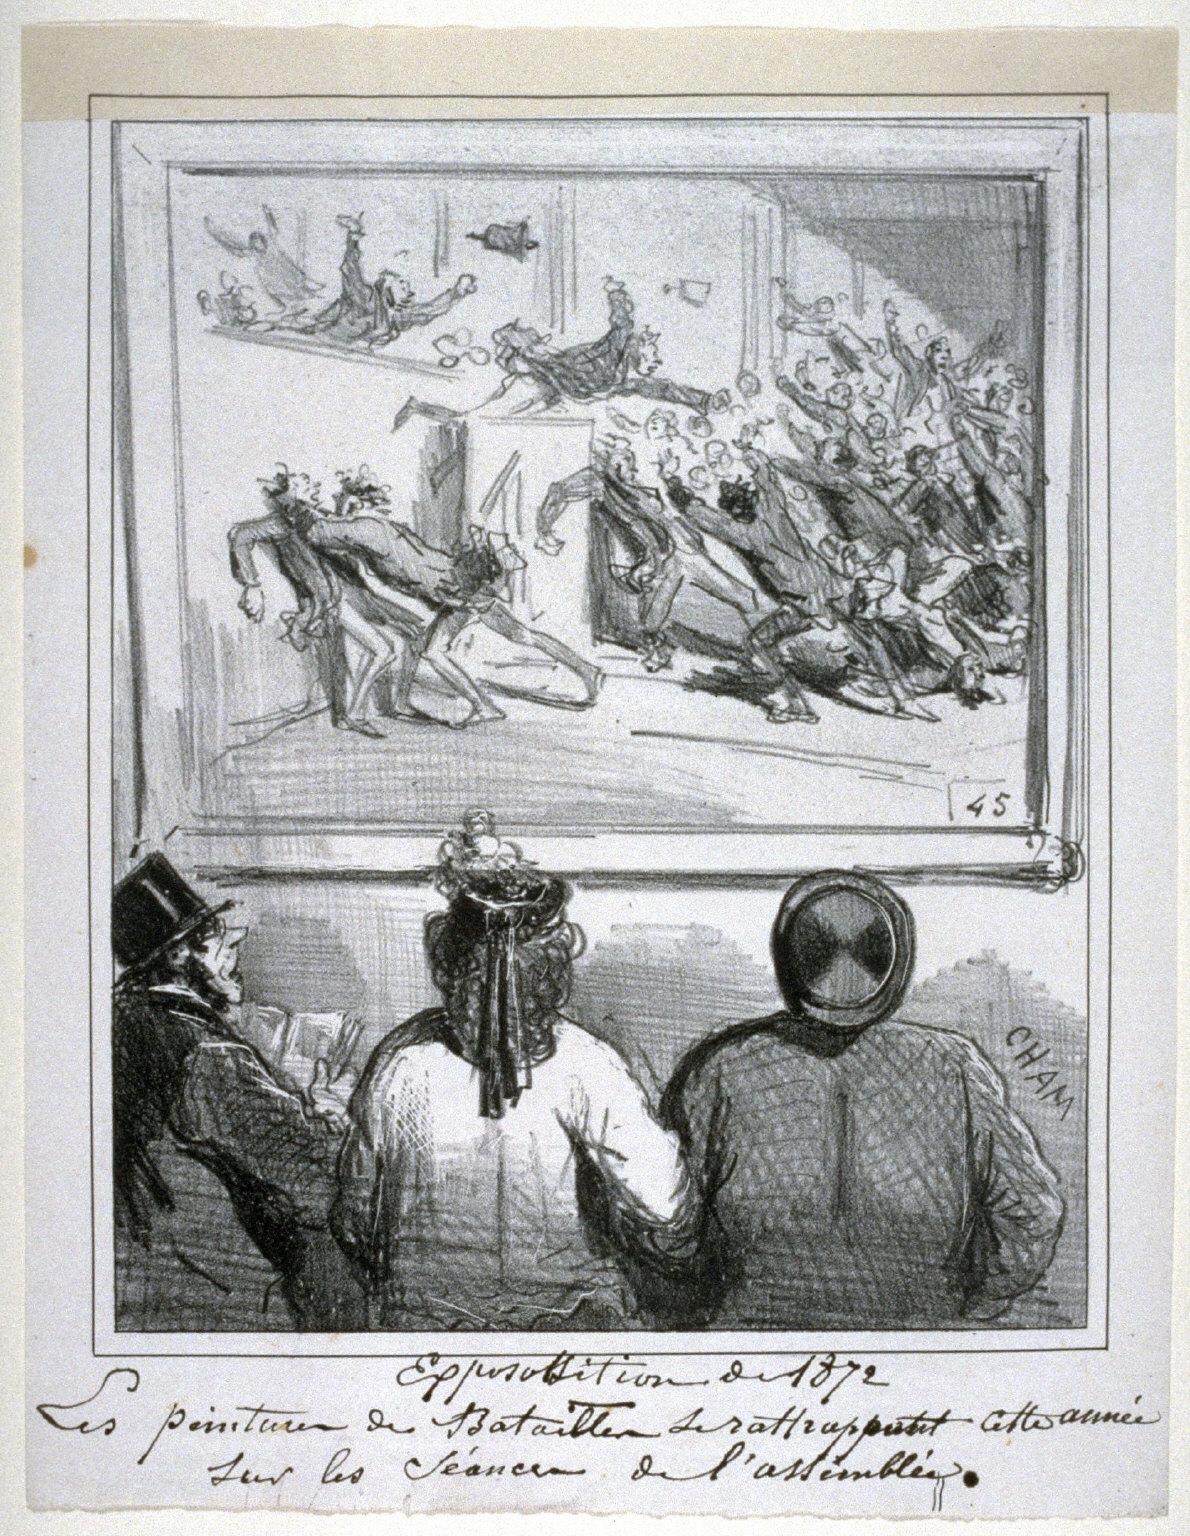 Exposition de 1872